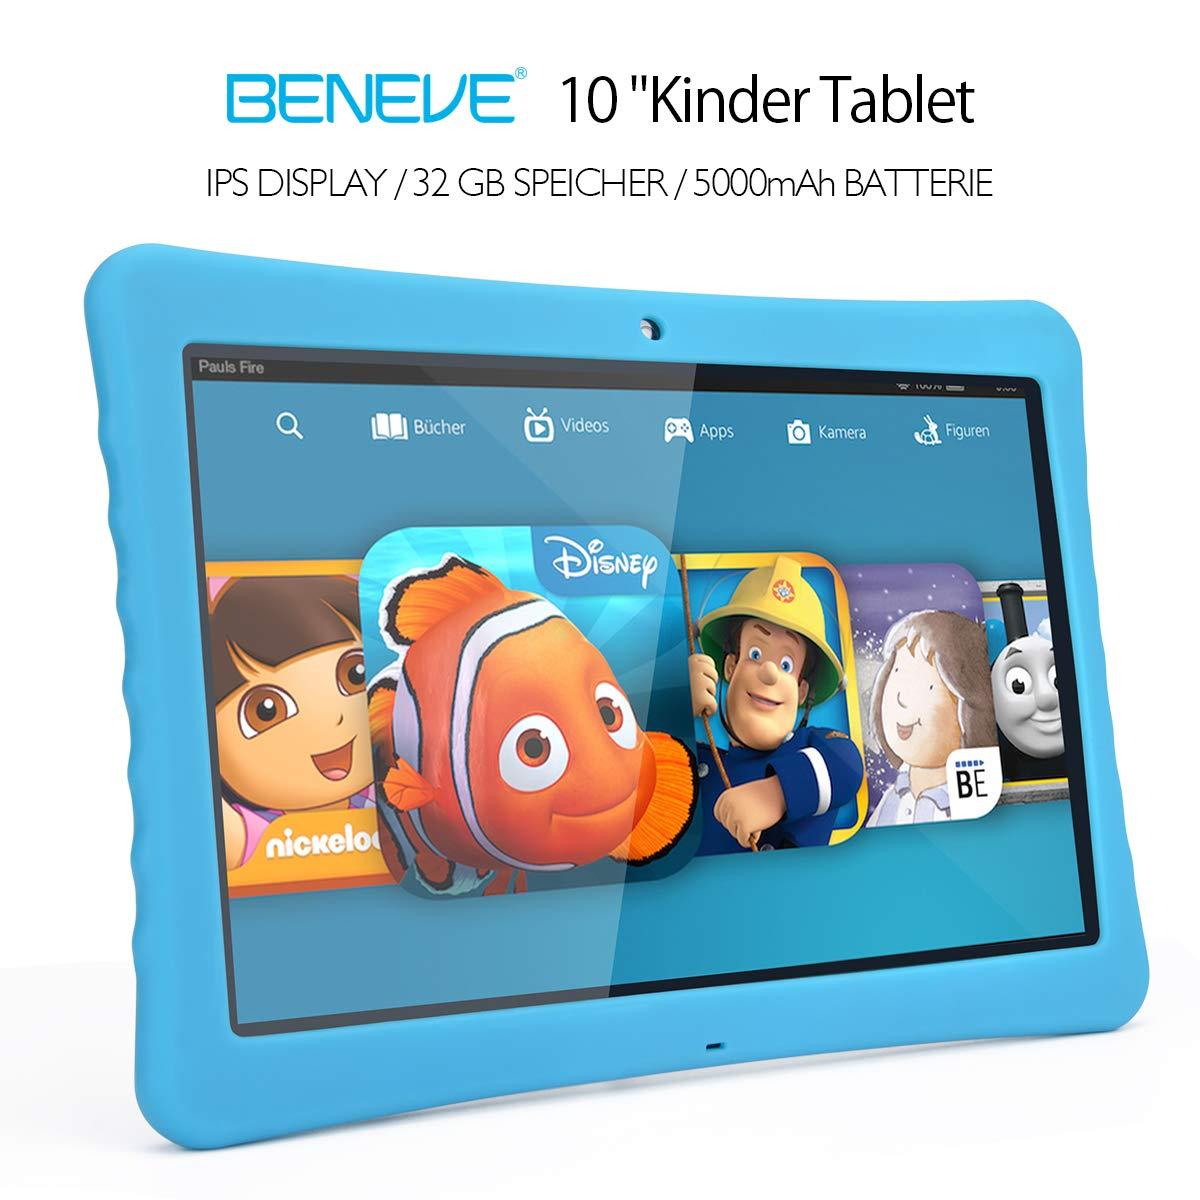 BENEVE 10 Kinder Tablet, 10,1 1080P Full HD Display Android 7,0, 2GB + 32 GB, Dual-Kamera Front 2MP + Rear 5MP, Bluetooth und WiFi-Blau Sungworld